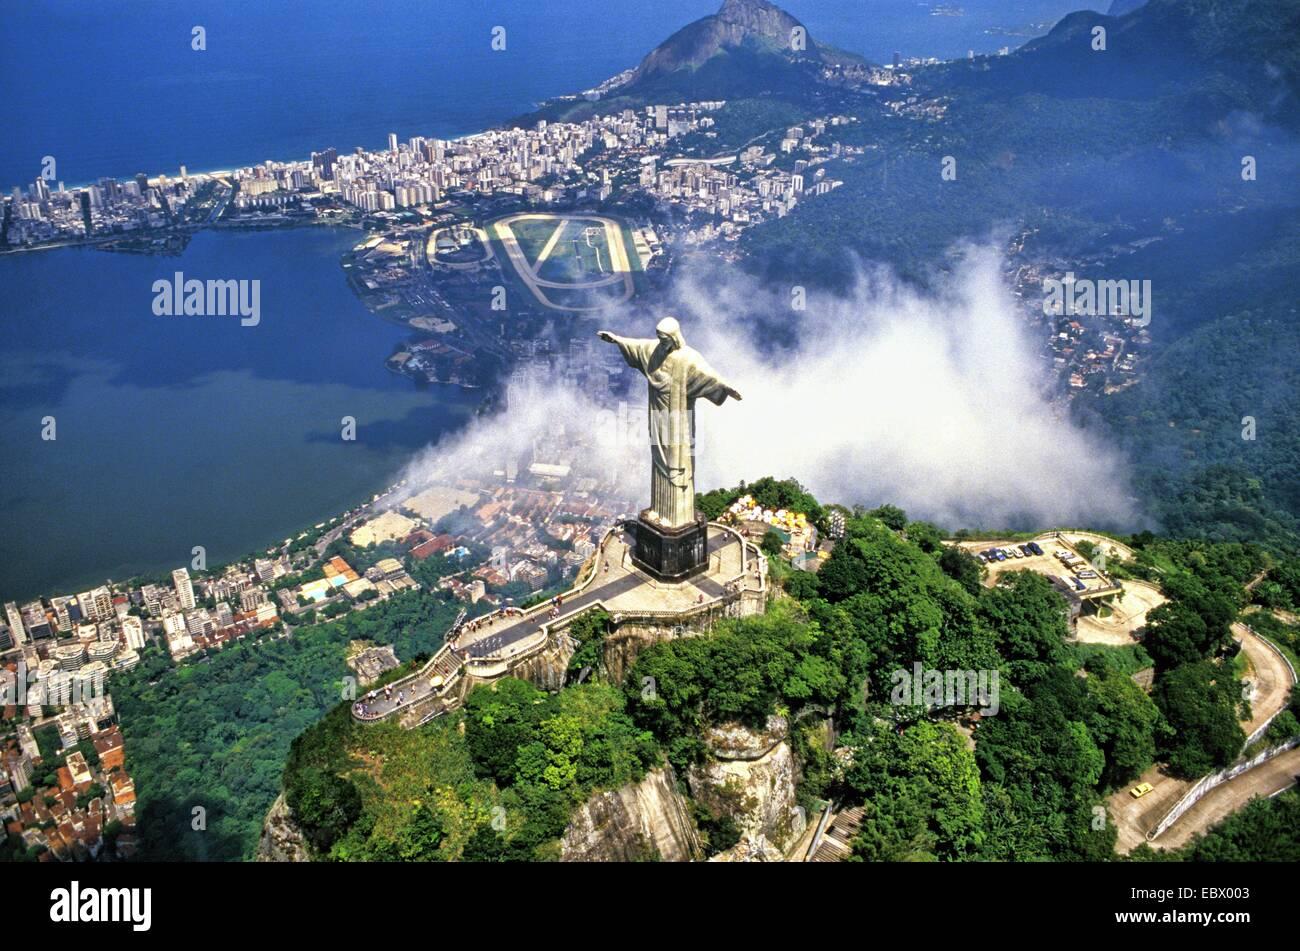 Luftbild Von Corcovado Christus Statue Brasilien Rio De Janeiro